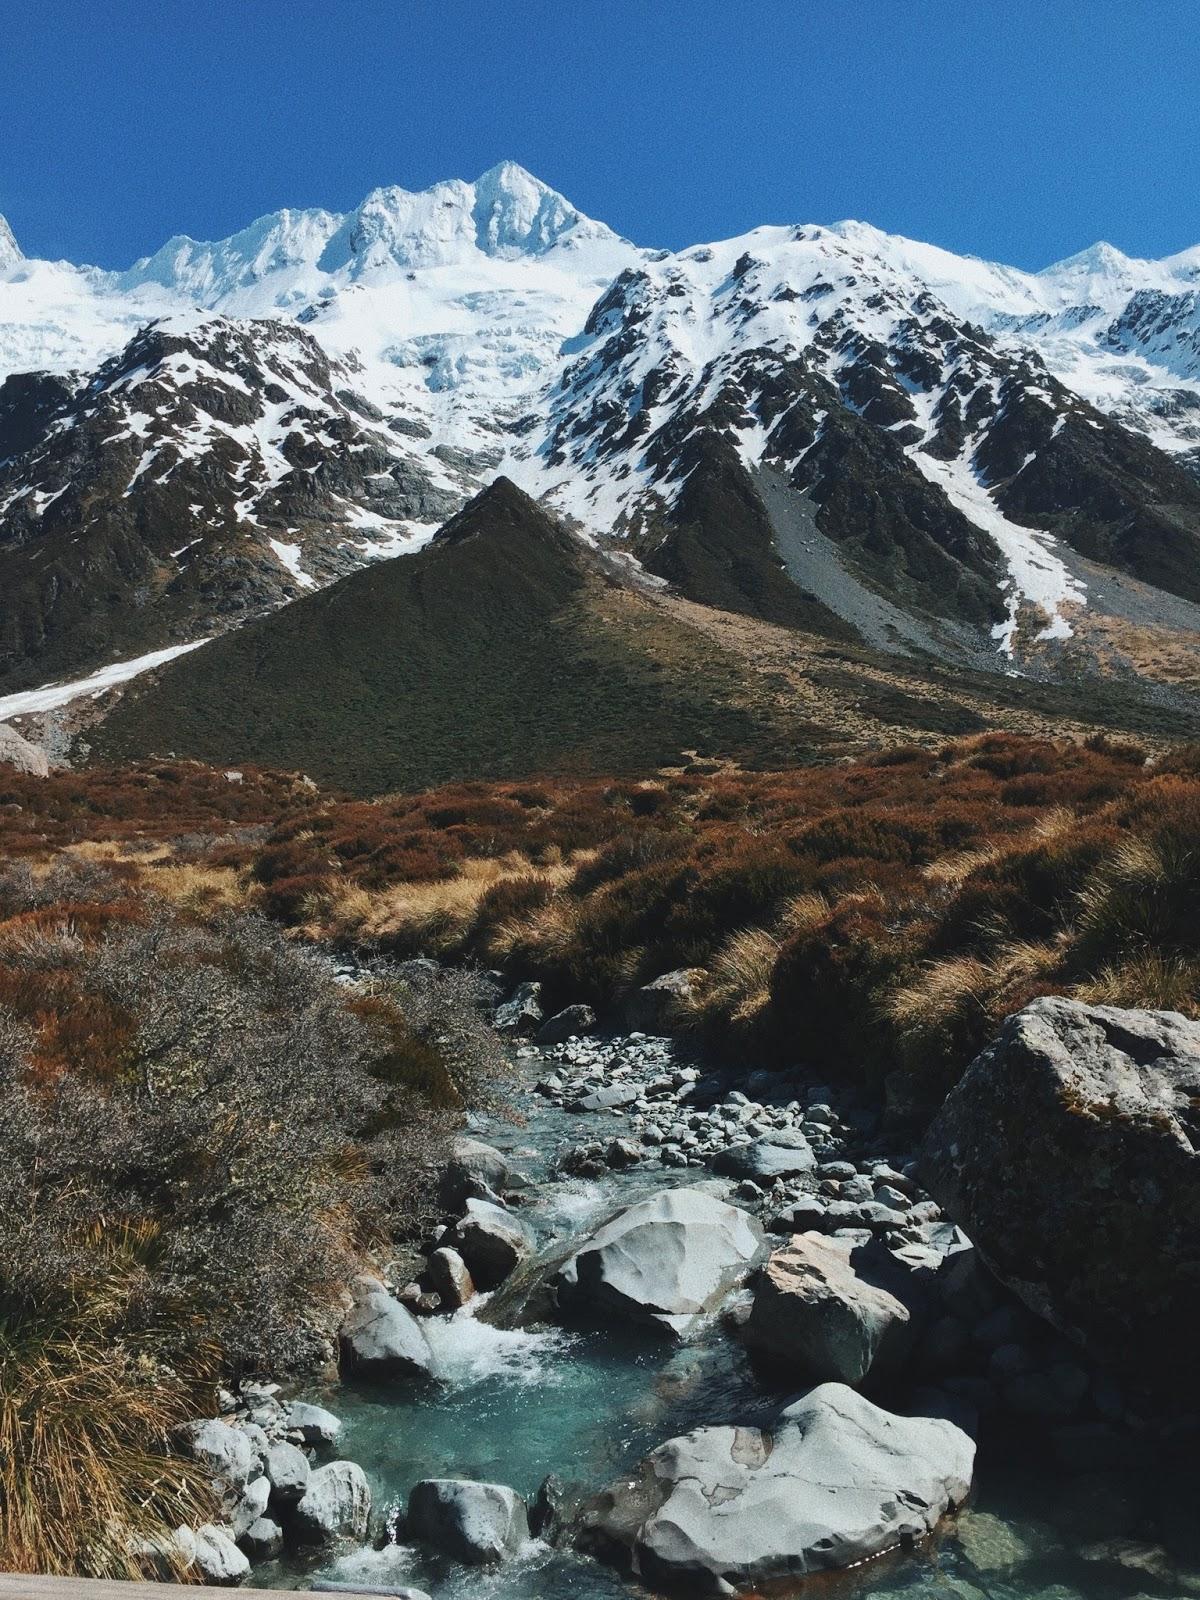 QUEENSTOWN, NEW ZEALAND - NAKEDSTYLE